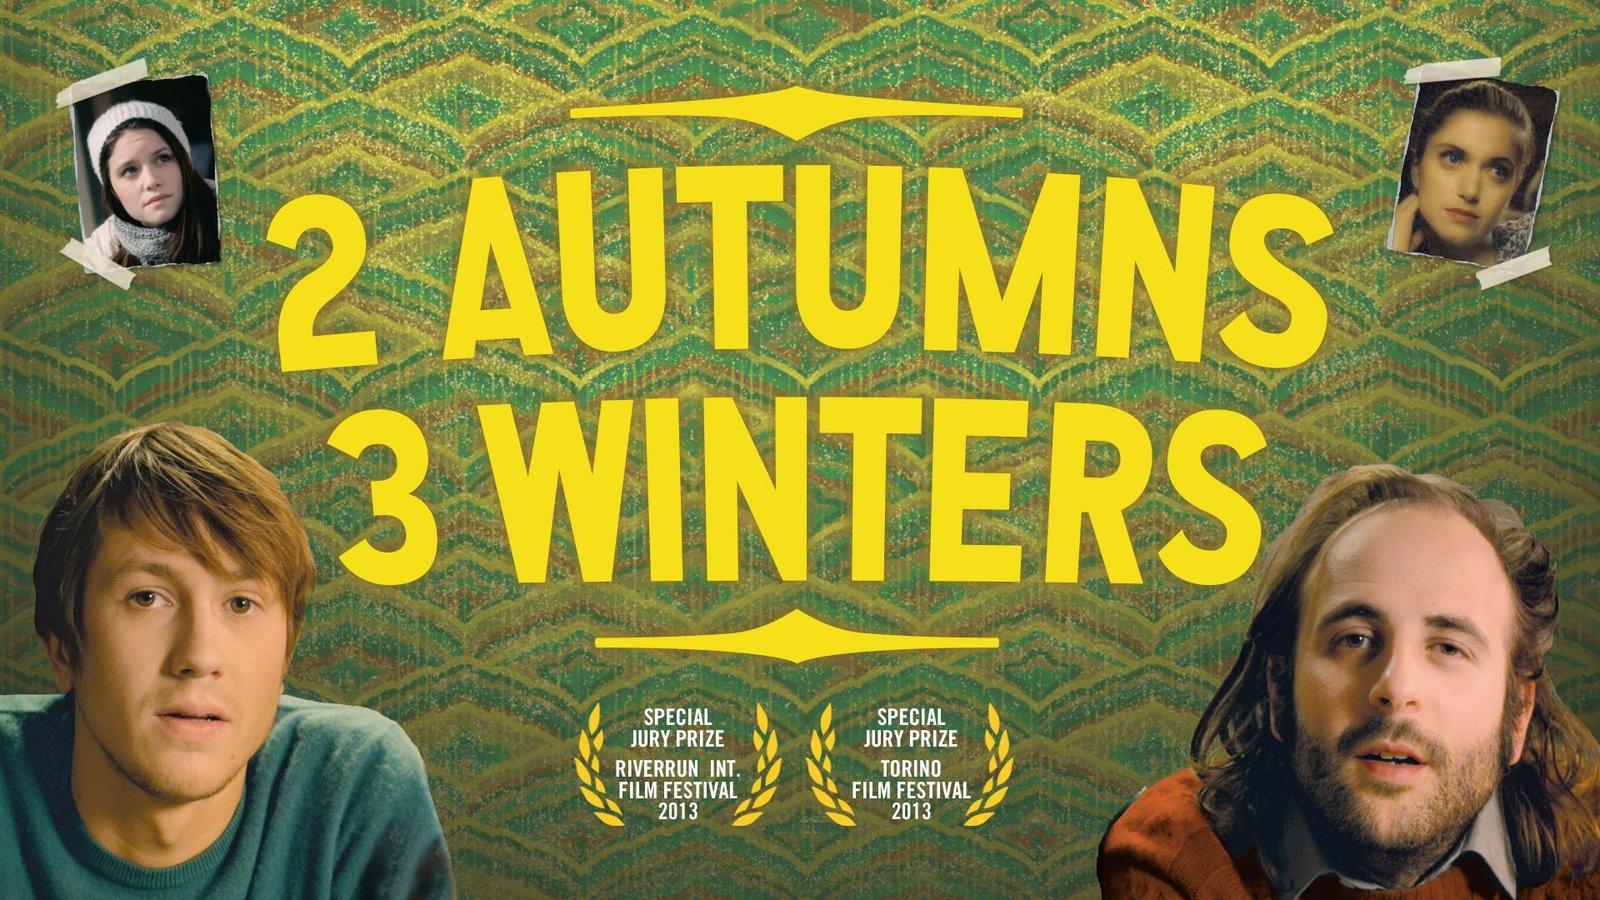 2-Autumns-3-Winters